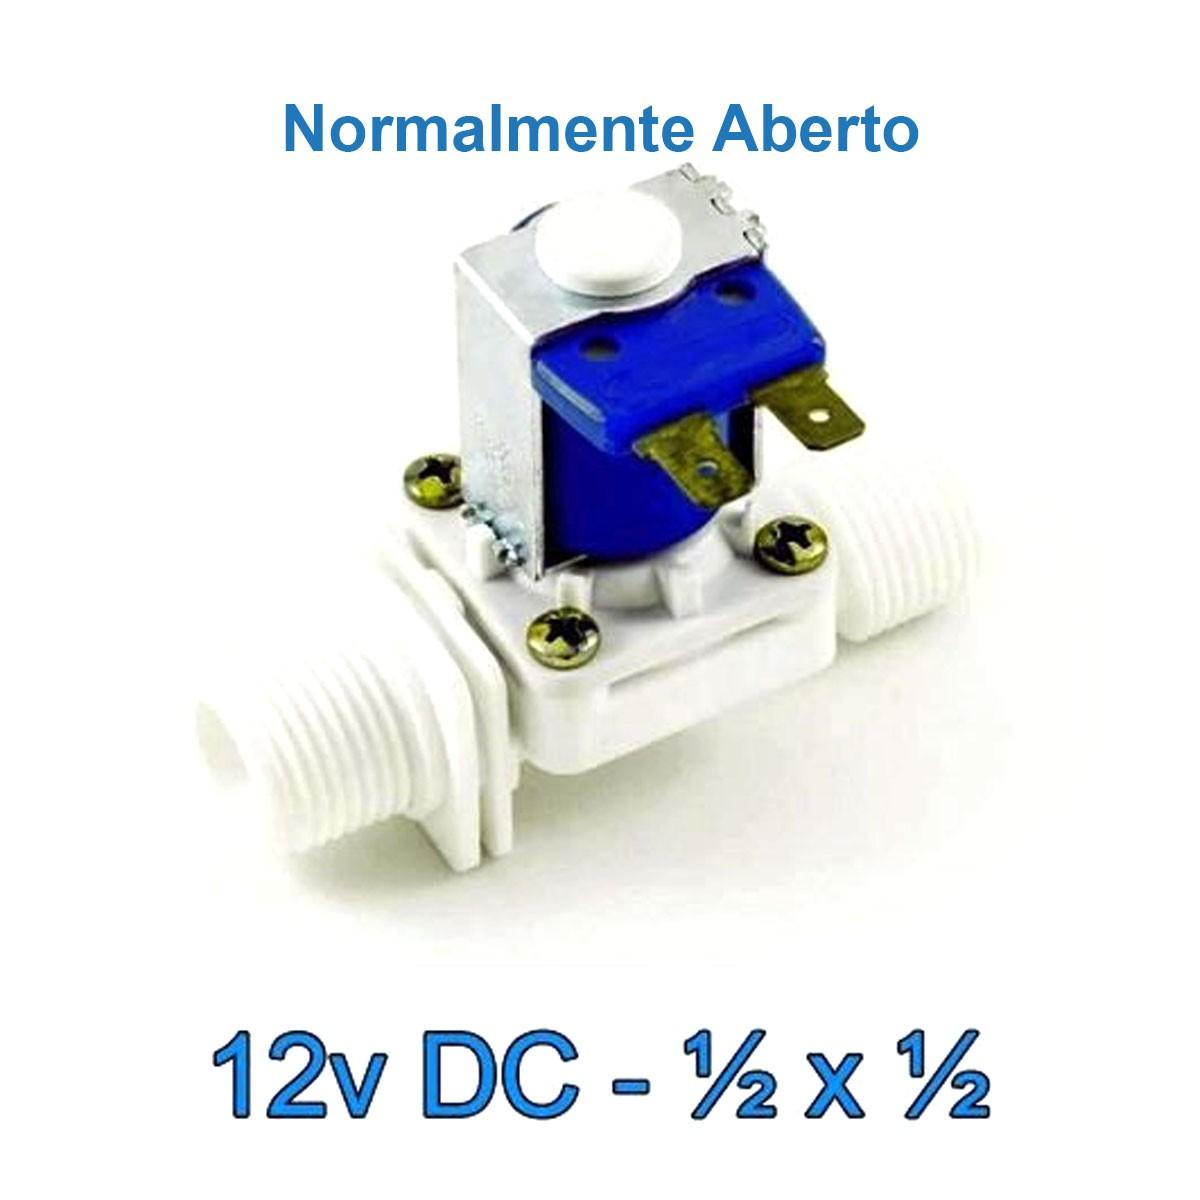 Válvula Solenoide Normalmente Aberta 12v DC 180° (1/2 X 1/2) VA 03